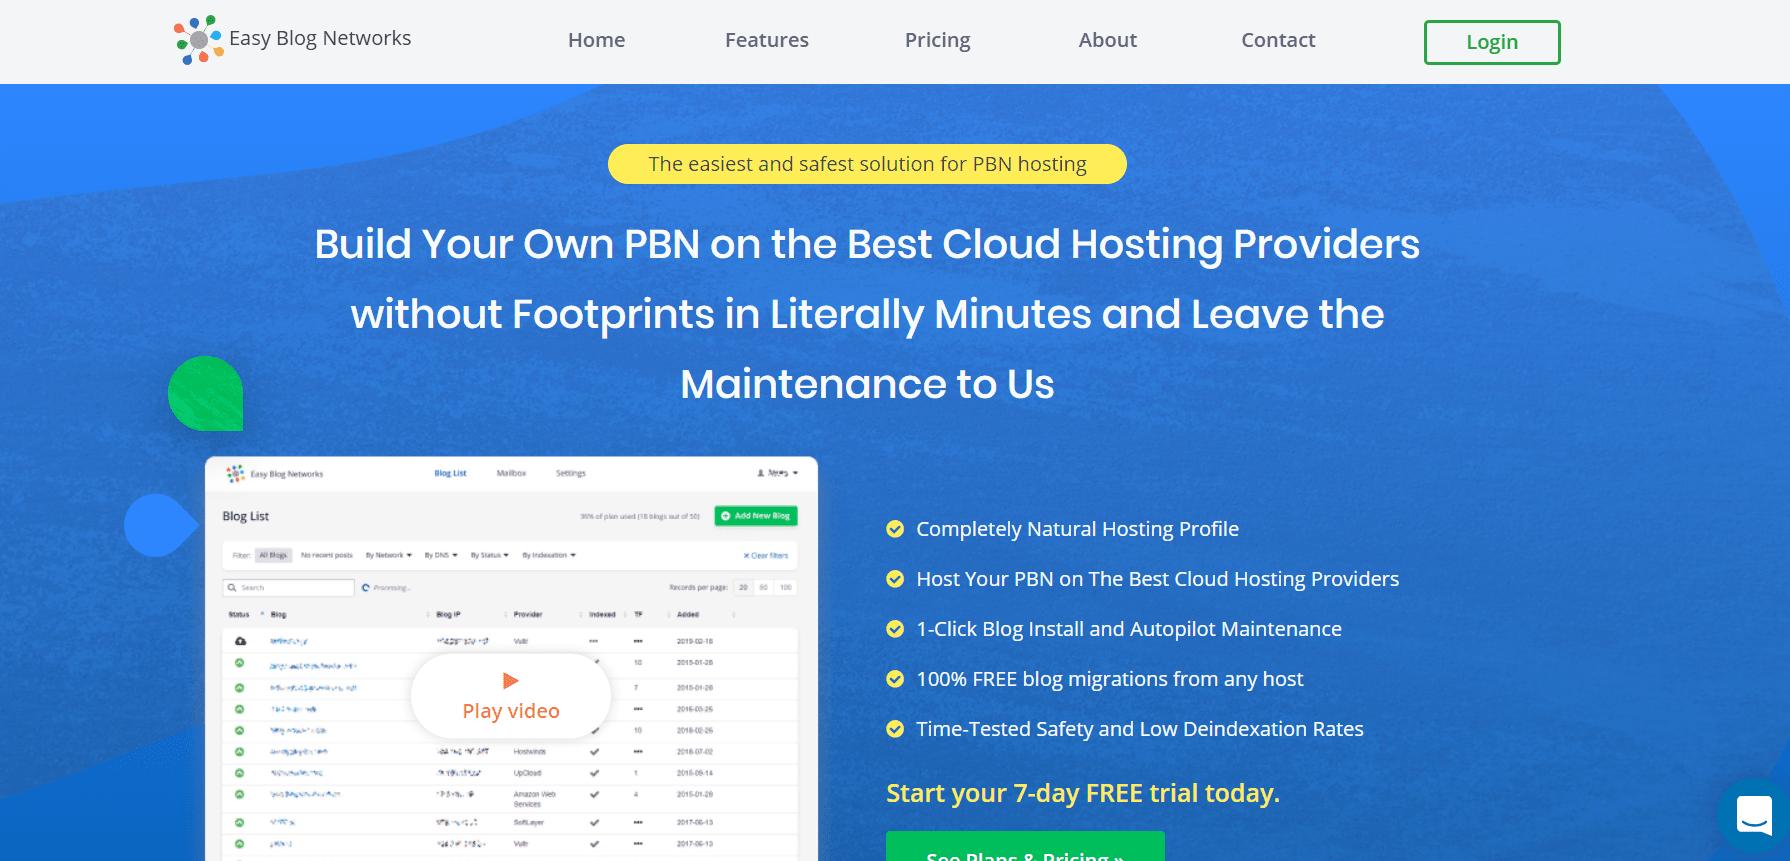 PBN Hosting and Autopilot Maintenance   Easy Blog Networks